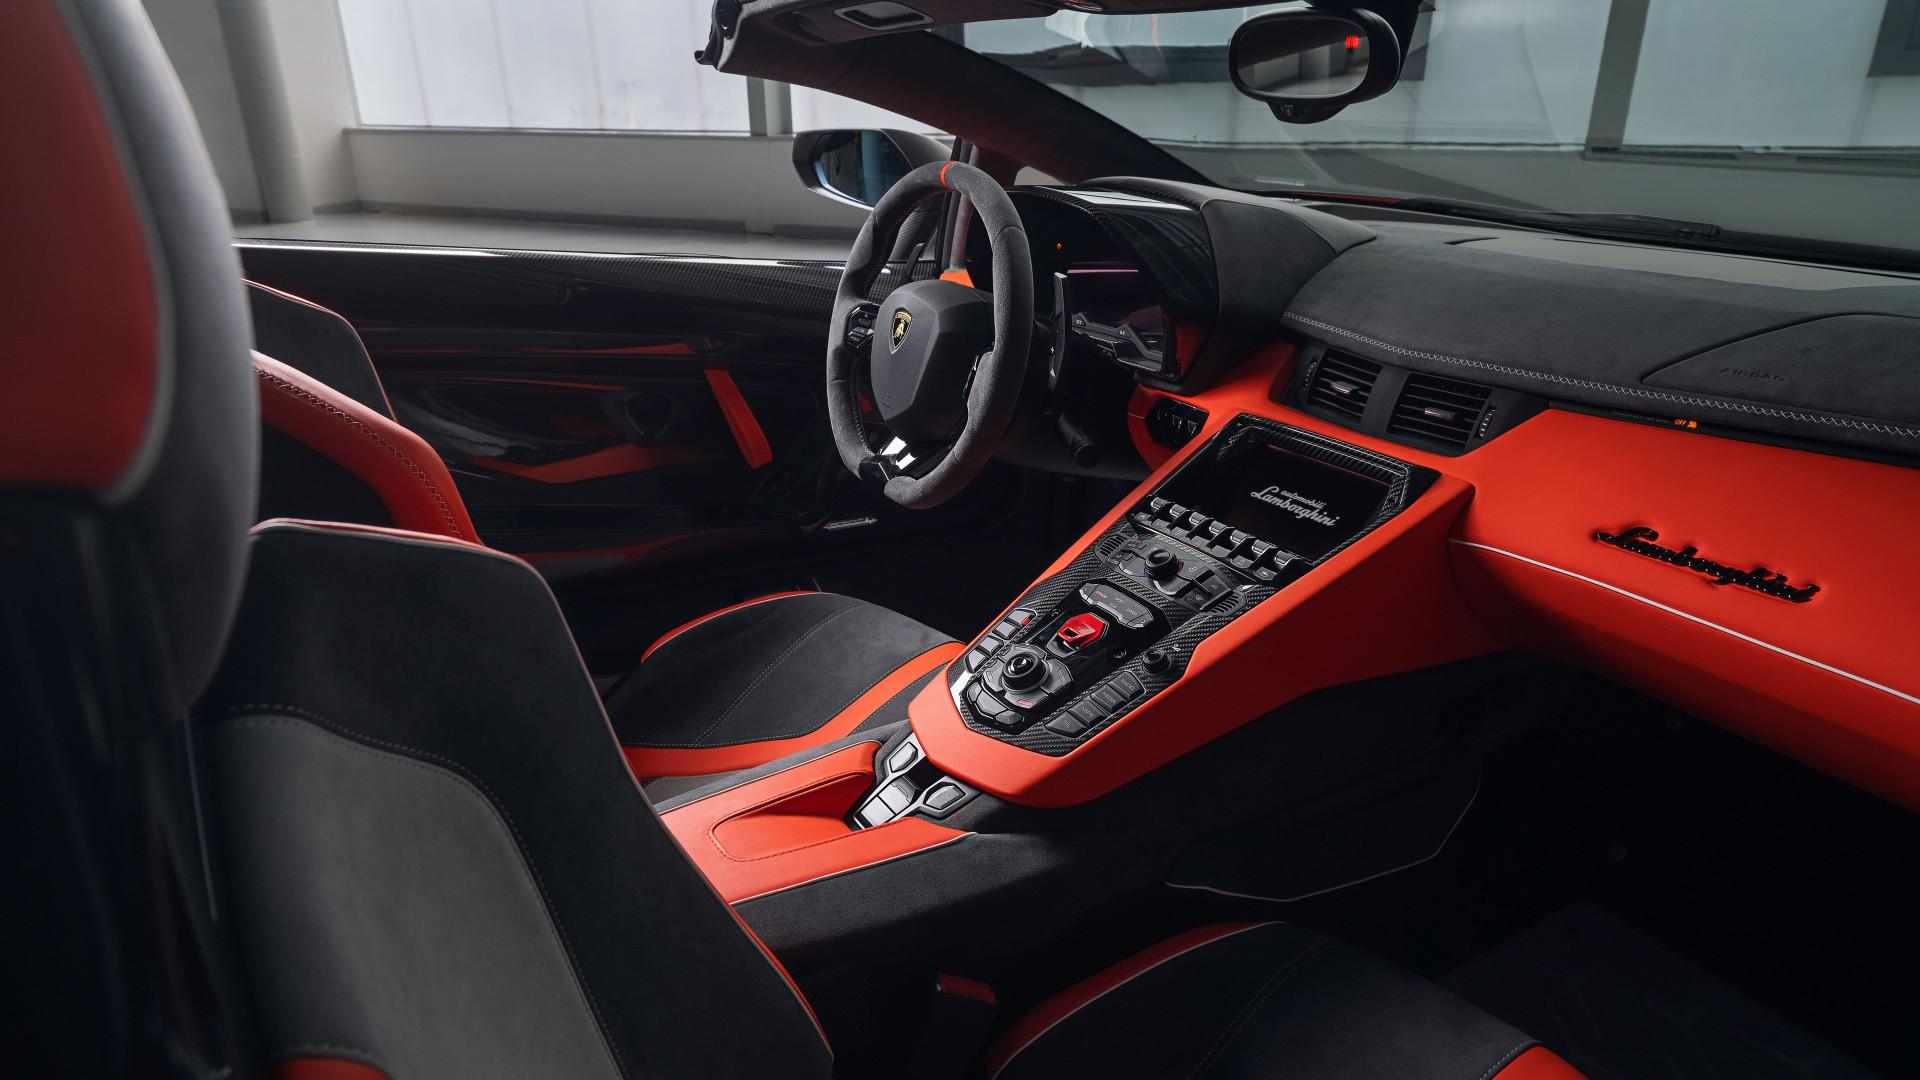 Lamborghini Aventador SVJ 63 Roadster 2020 4K Interior Wallpaper | HD Car Wallpapers | ID #13067